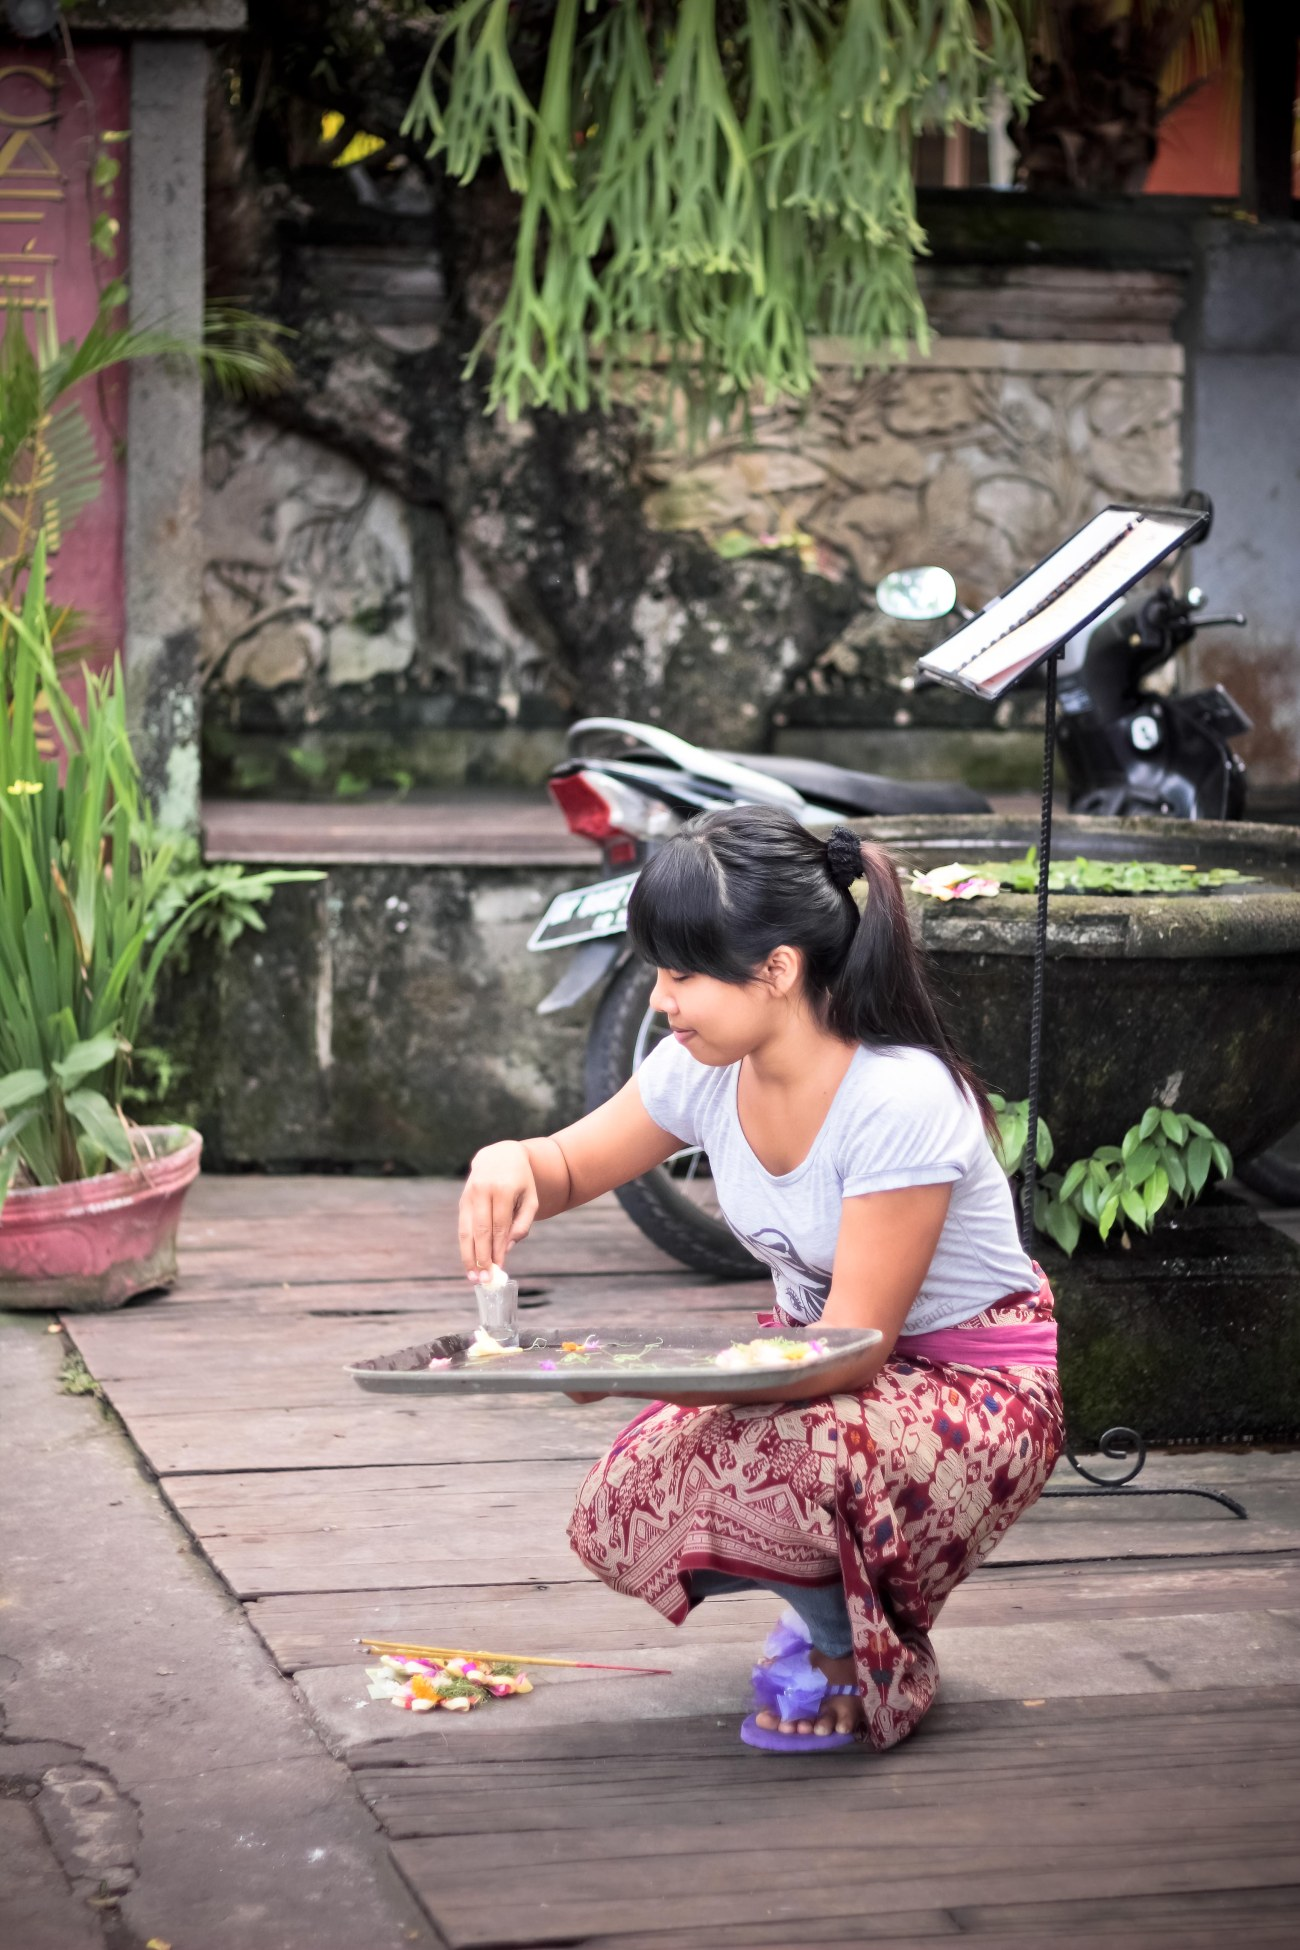 Gadis Bali sembahyang di depan Rendezvousdoux.